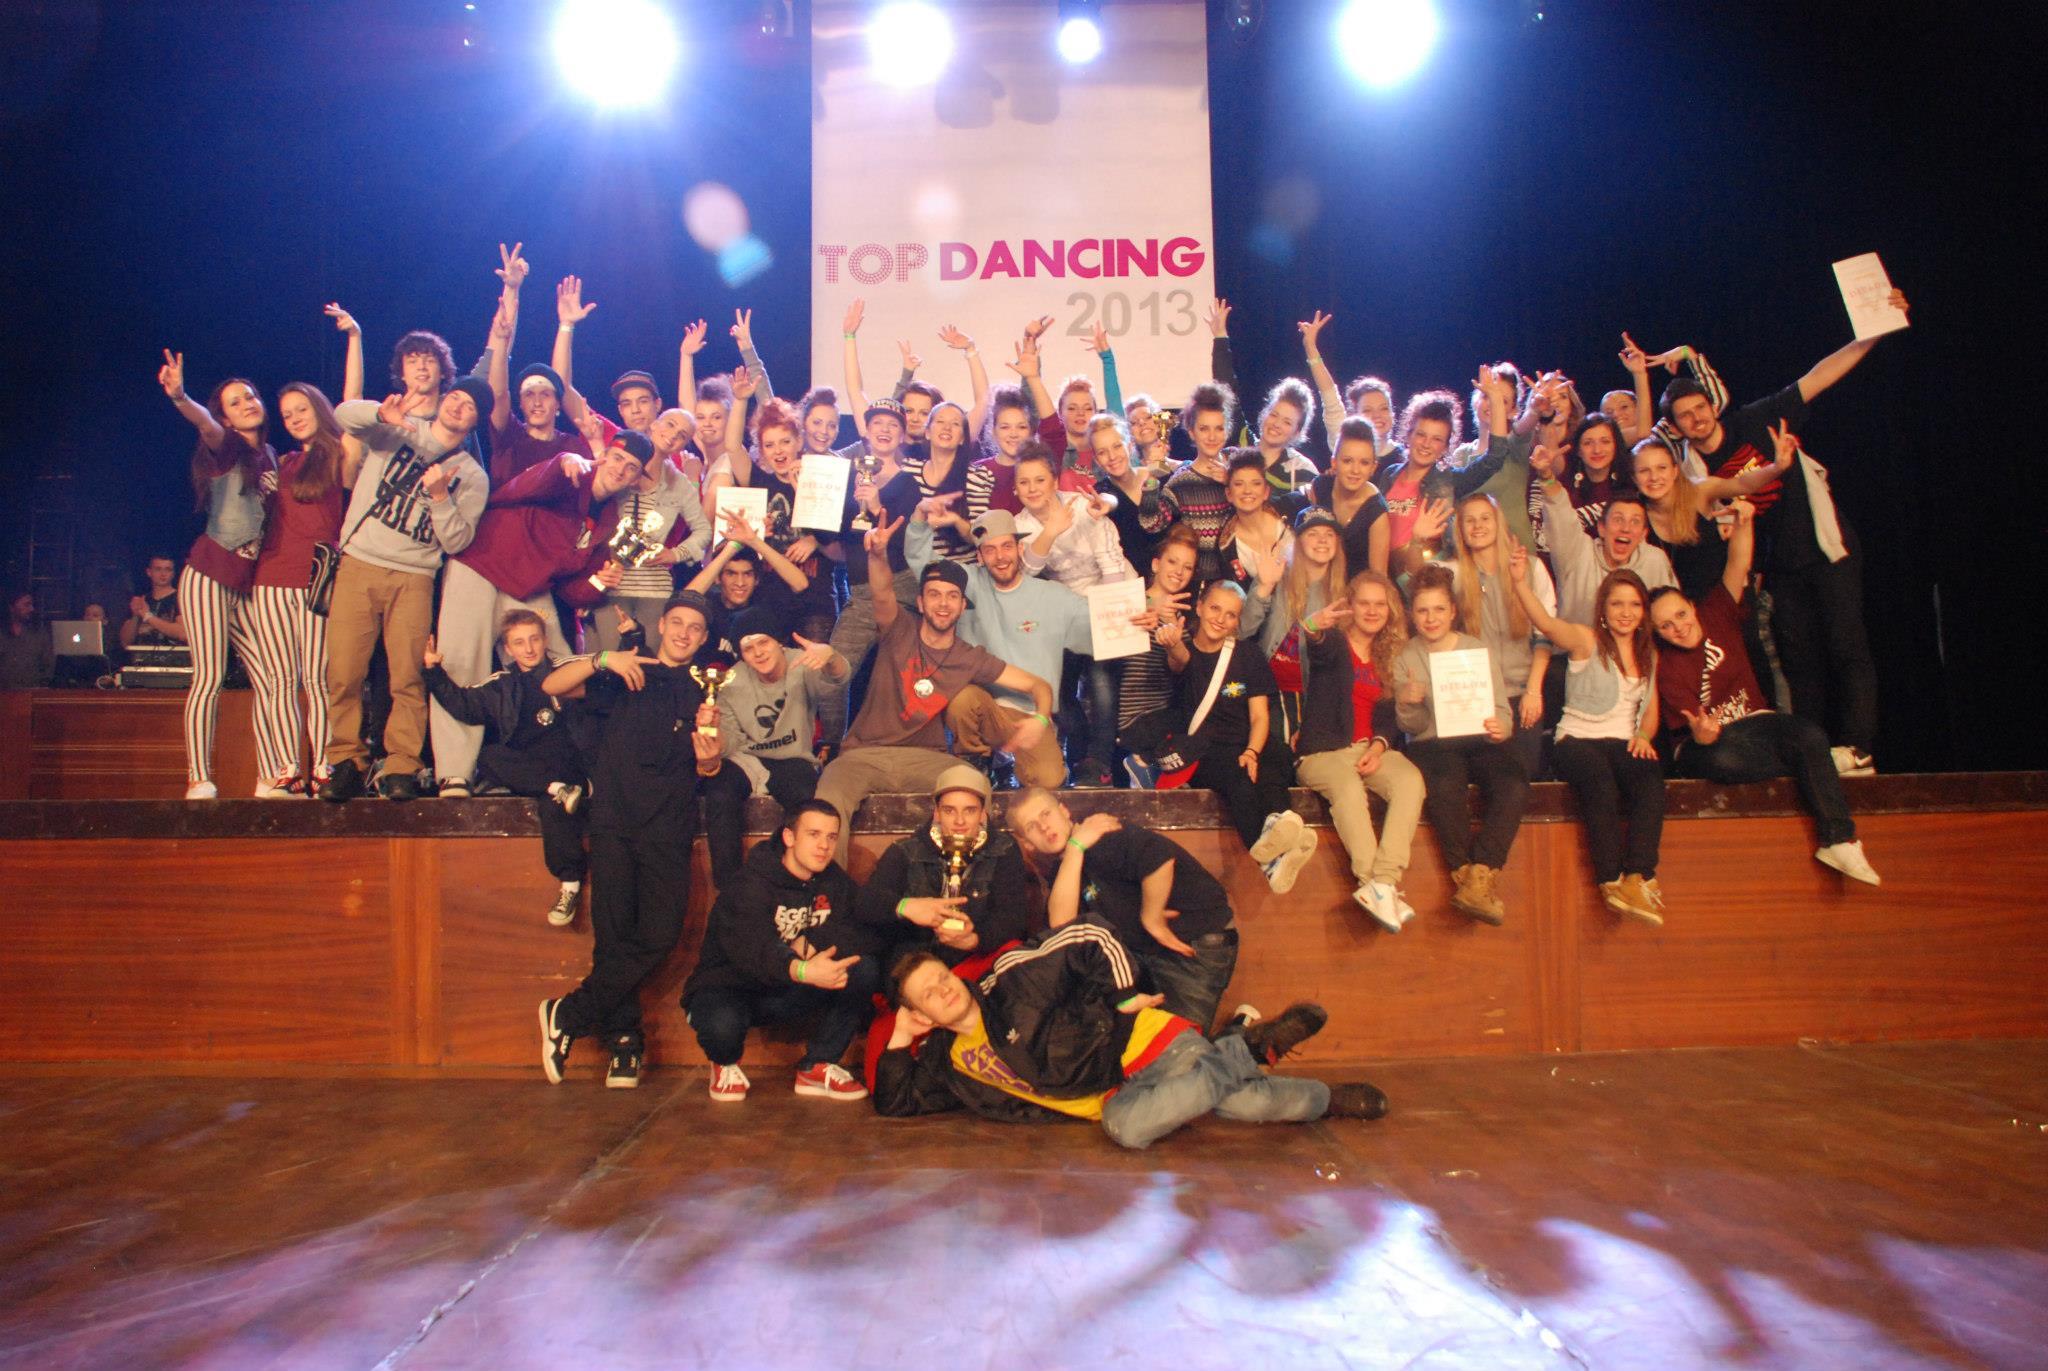 top dancing